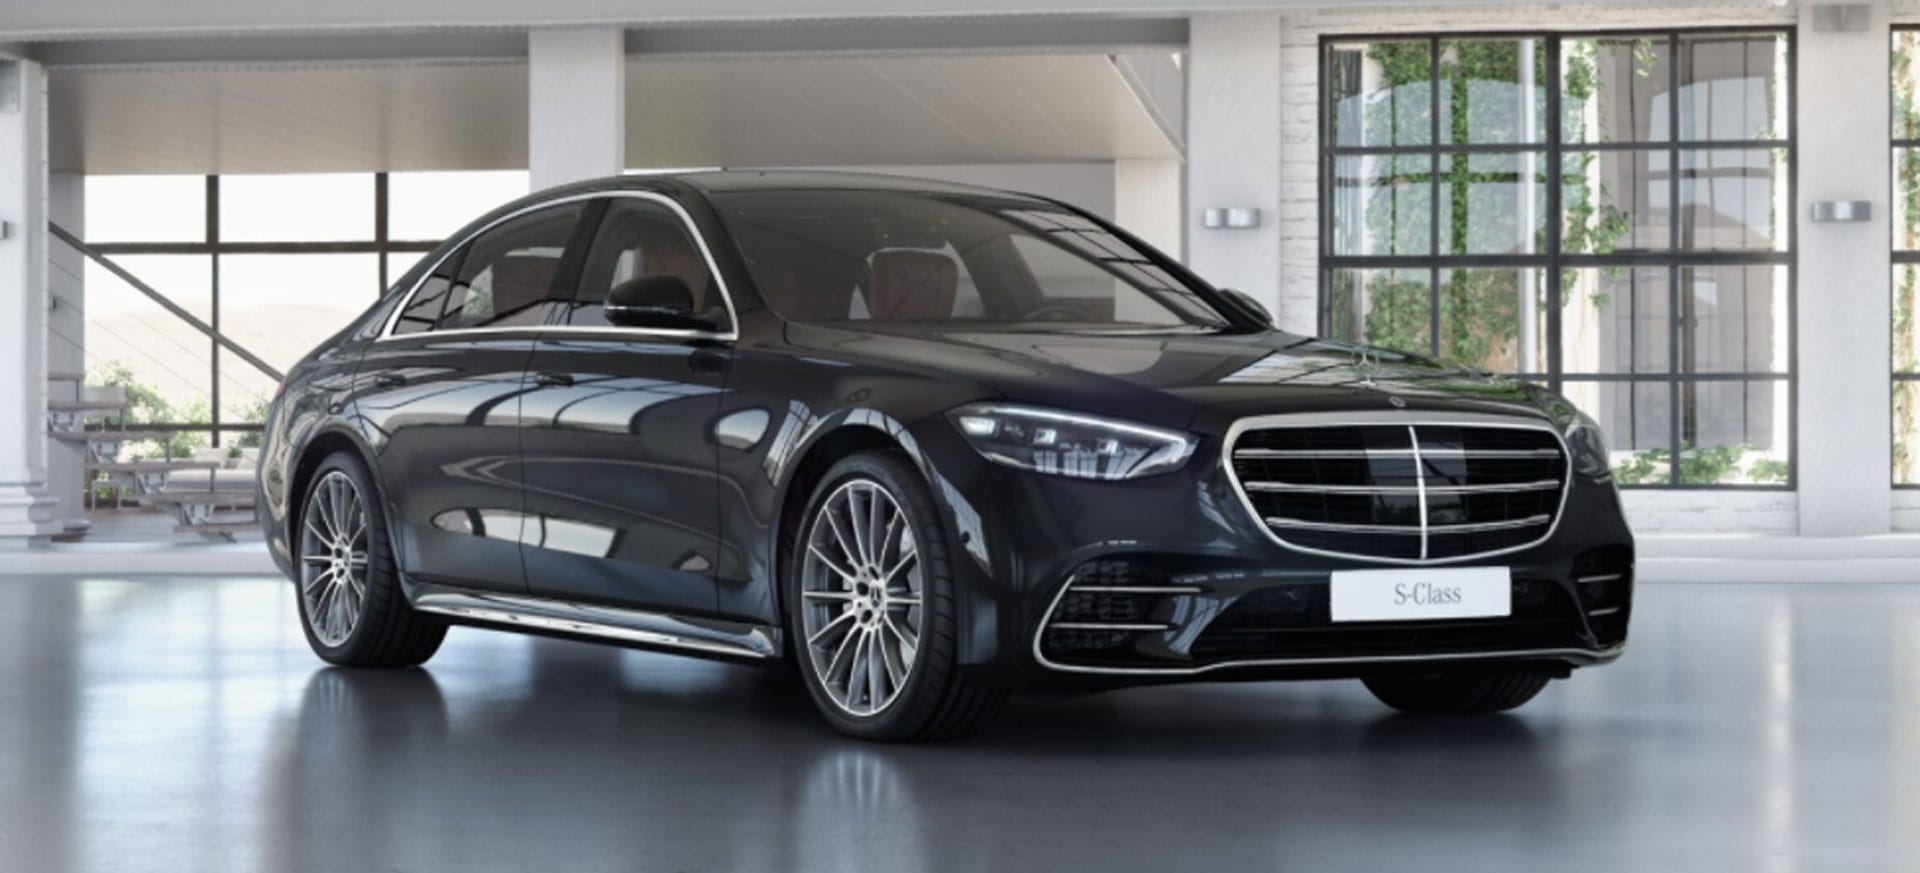 Mercedes-Benz S-Class Limousine 0152600320